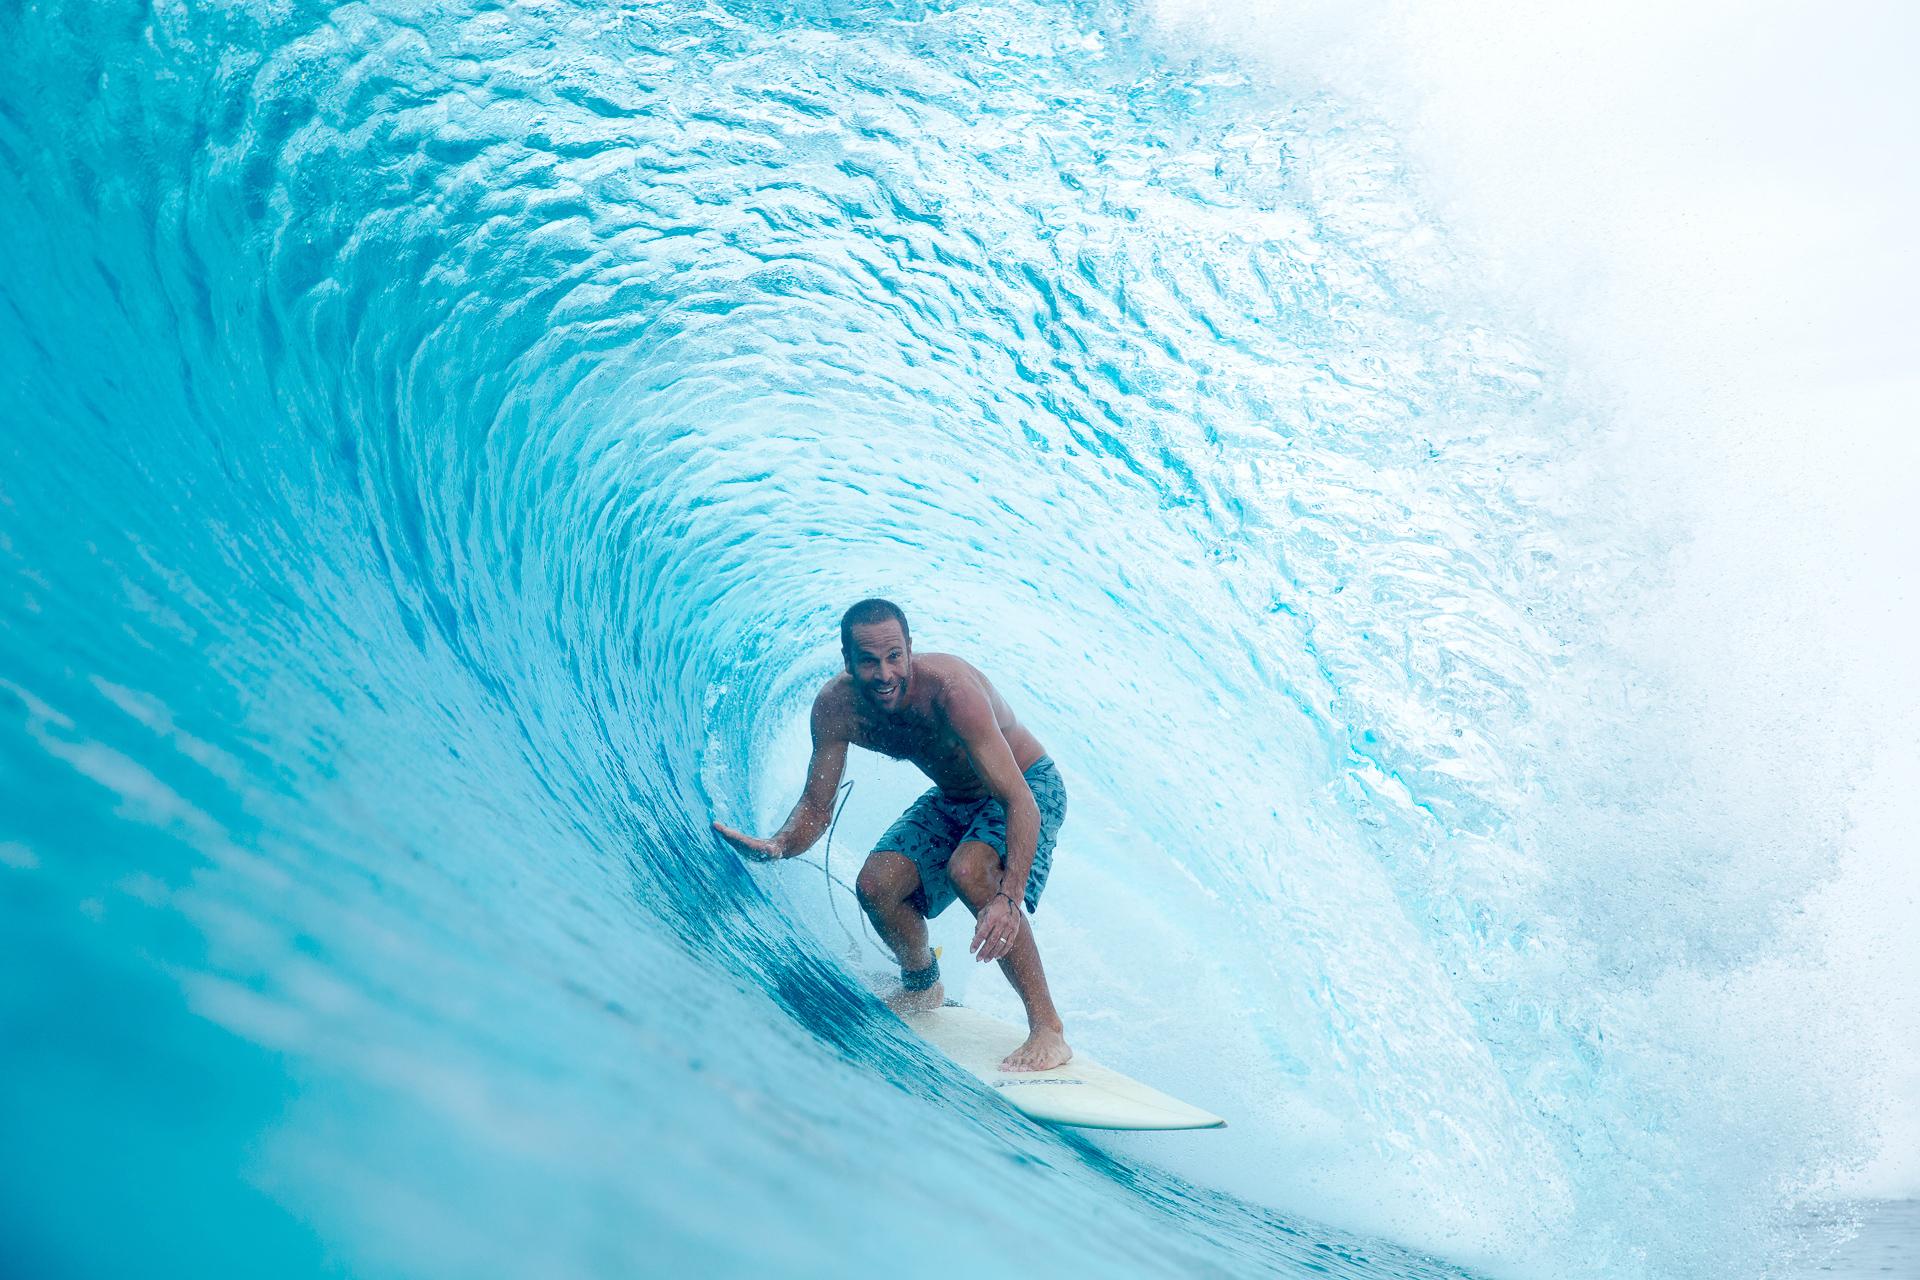 Inside Jack Johnson and Kelly Slater's Surfing Safari